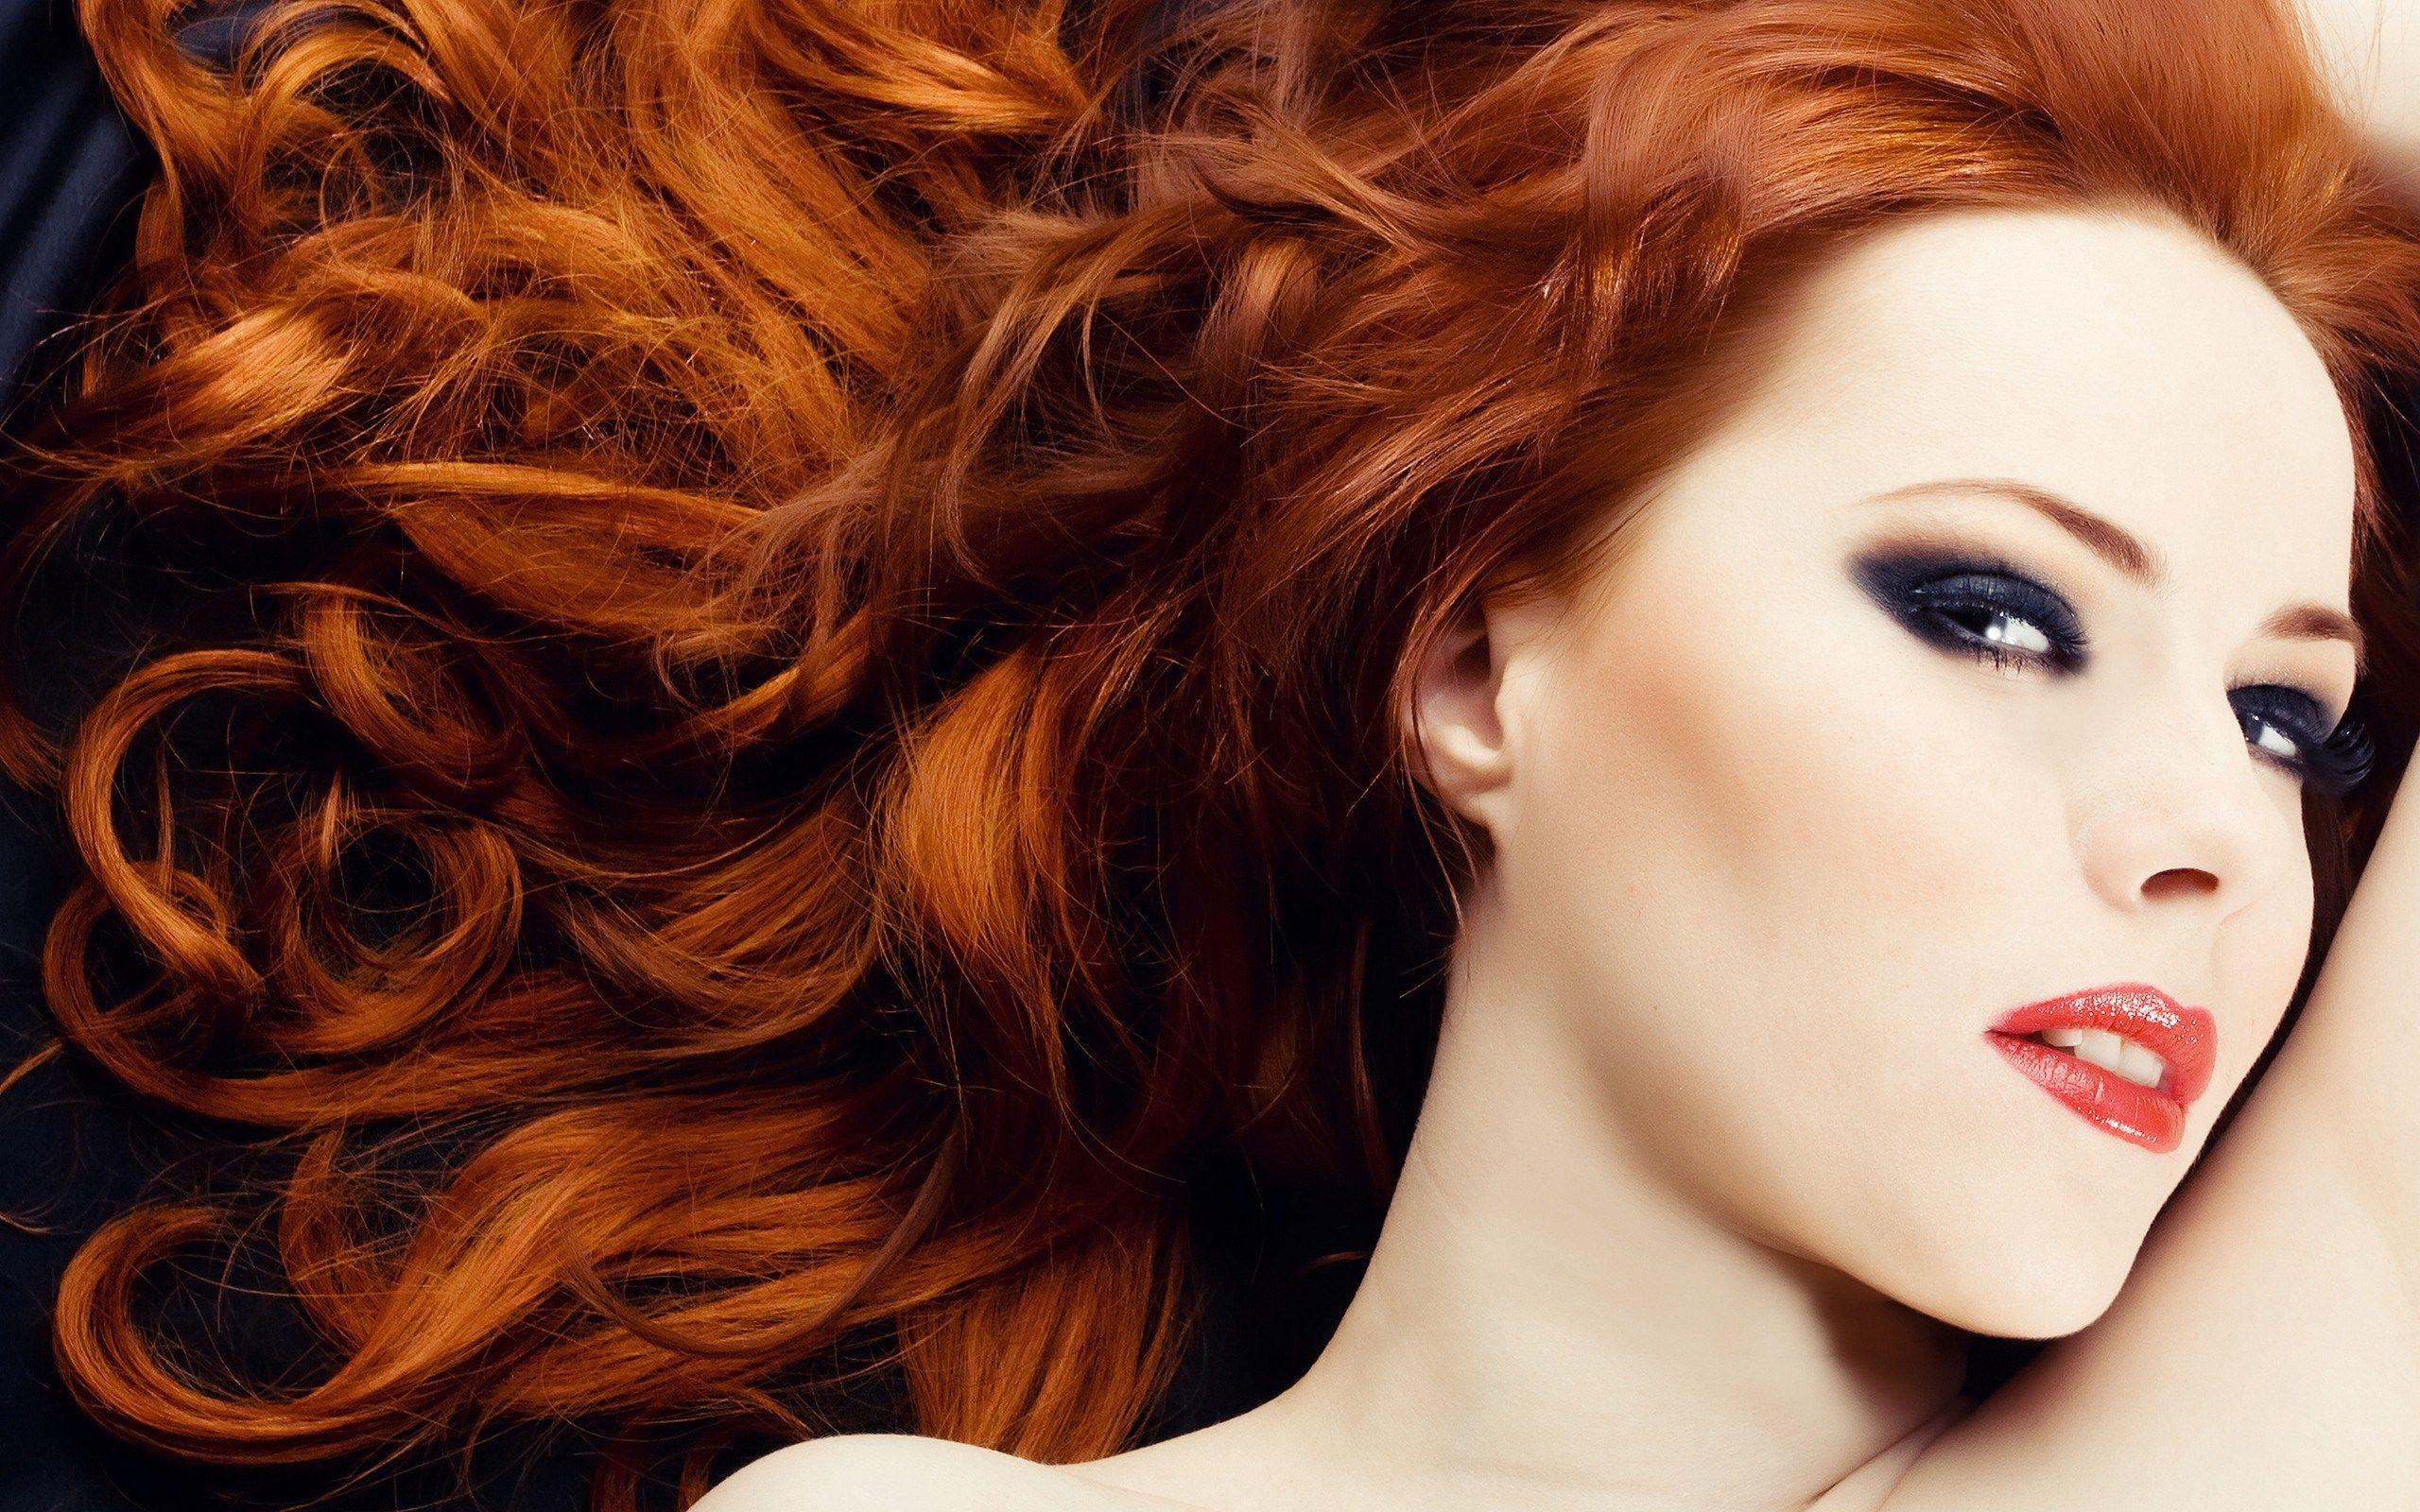 Photo redhead woman